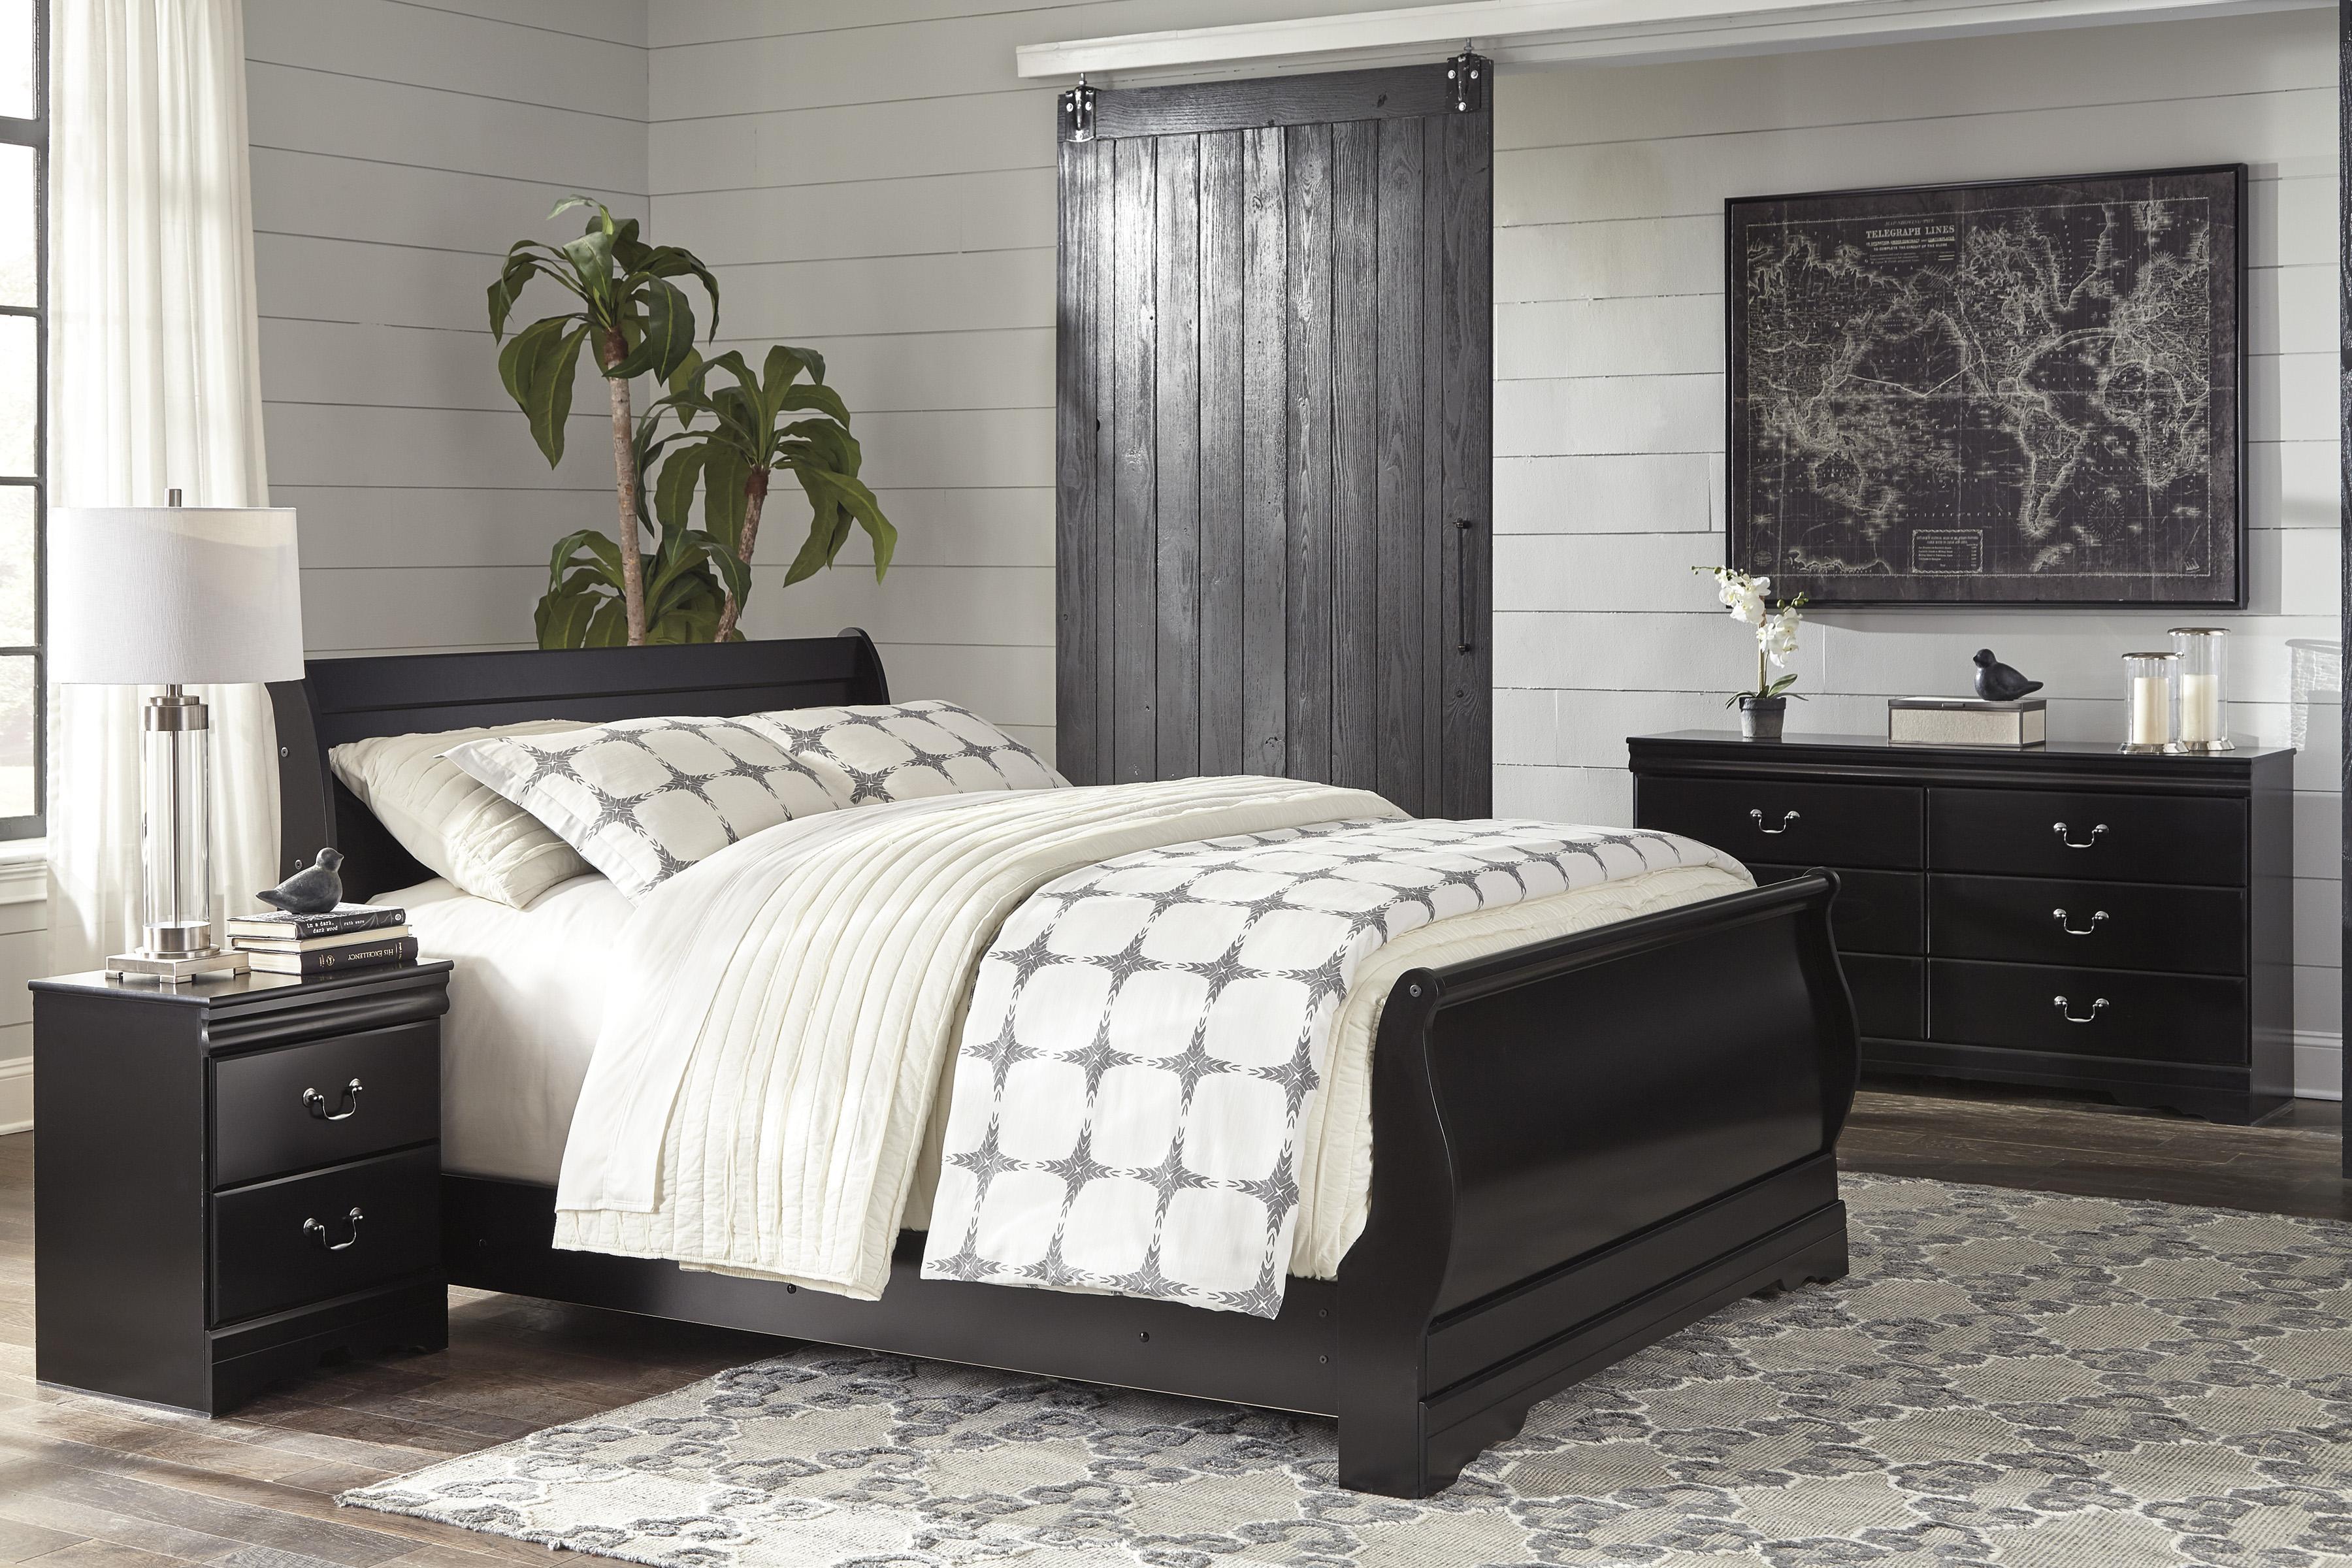 Huey Vineyard Full Sleigh Bed, Dresser & Mirror  / $19.99 A Week